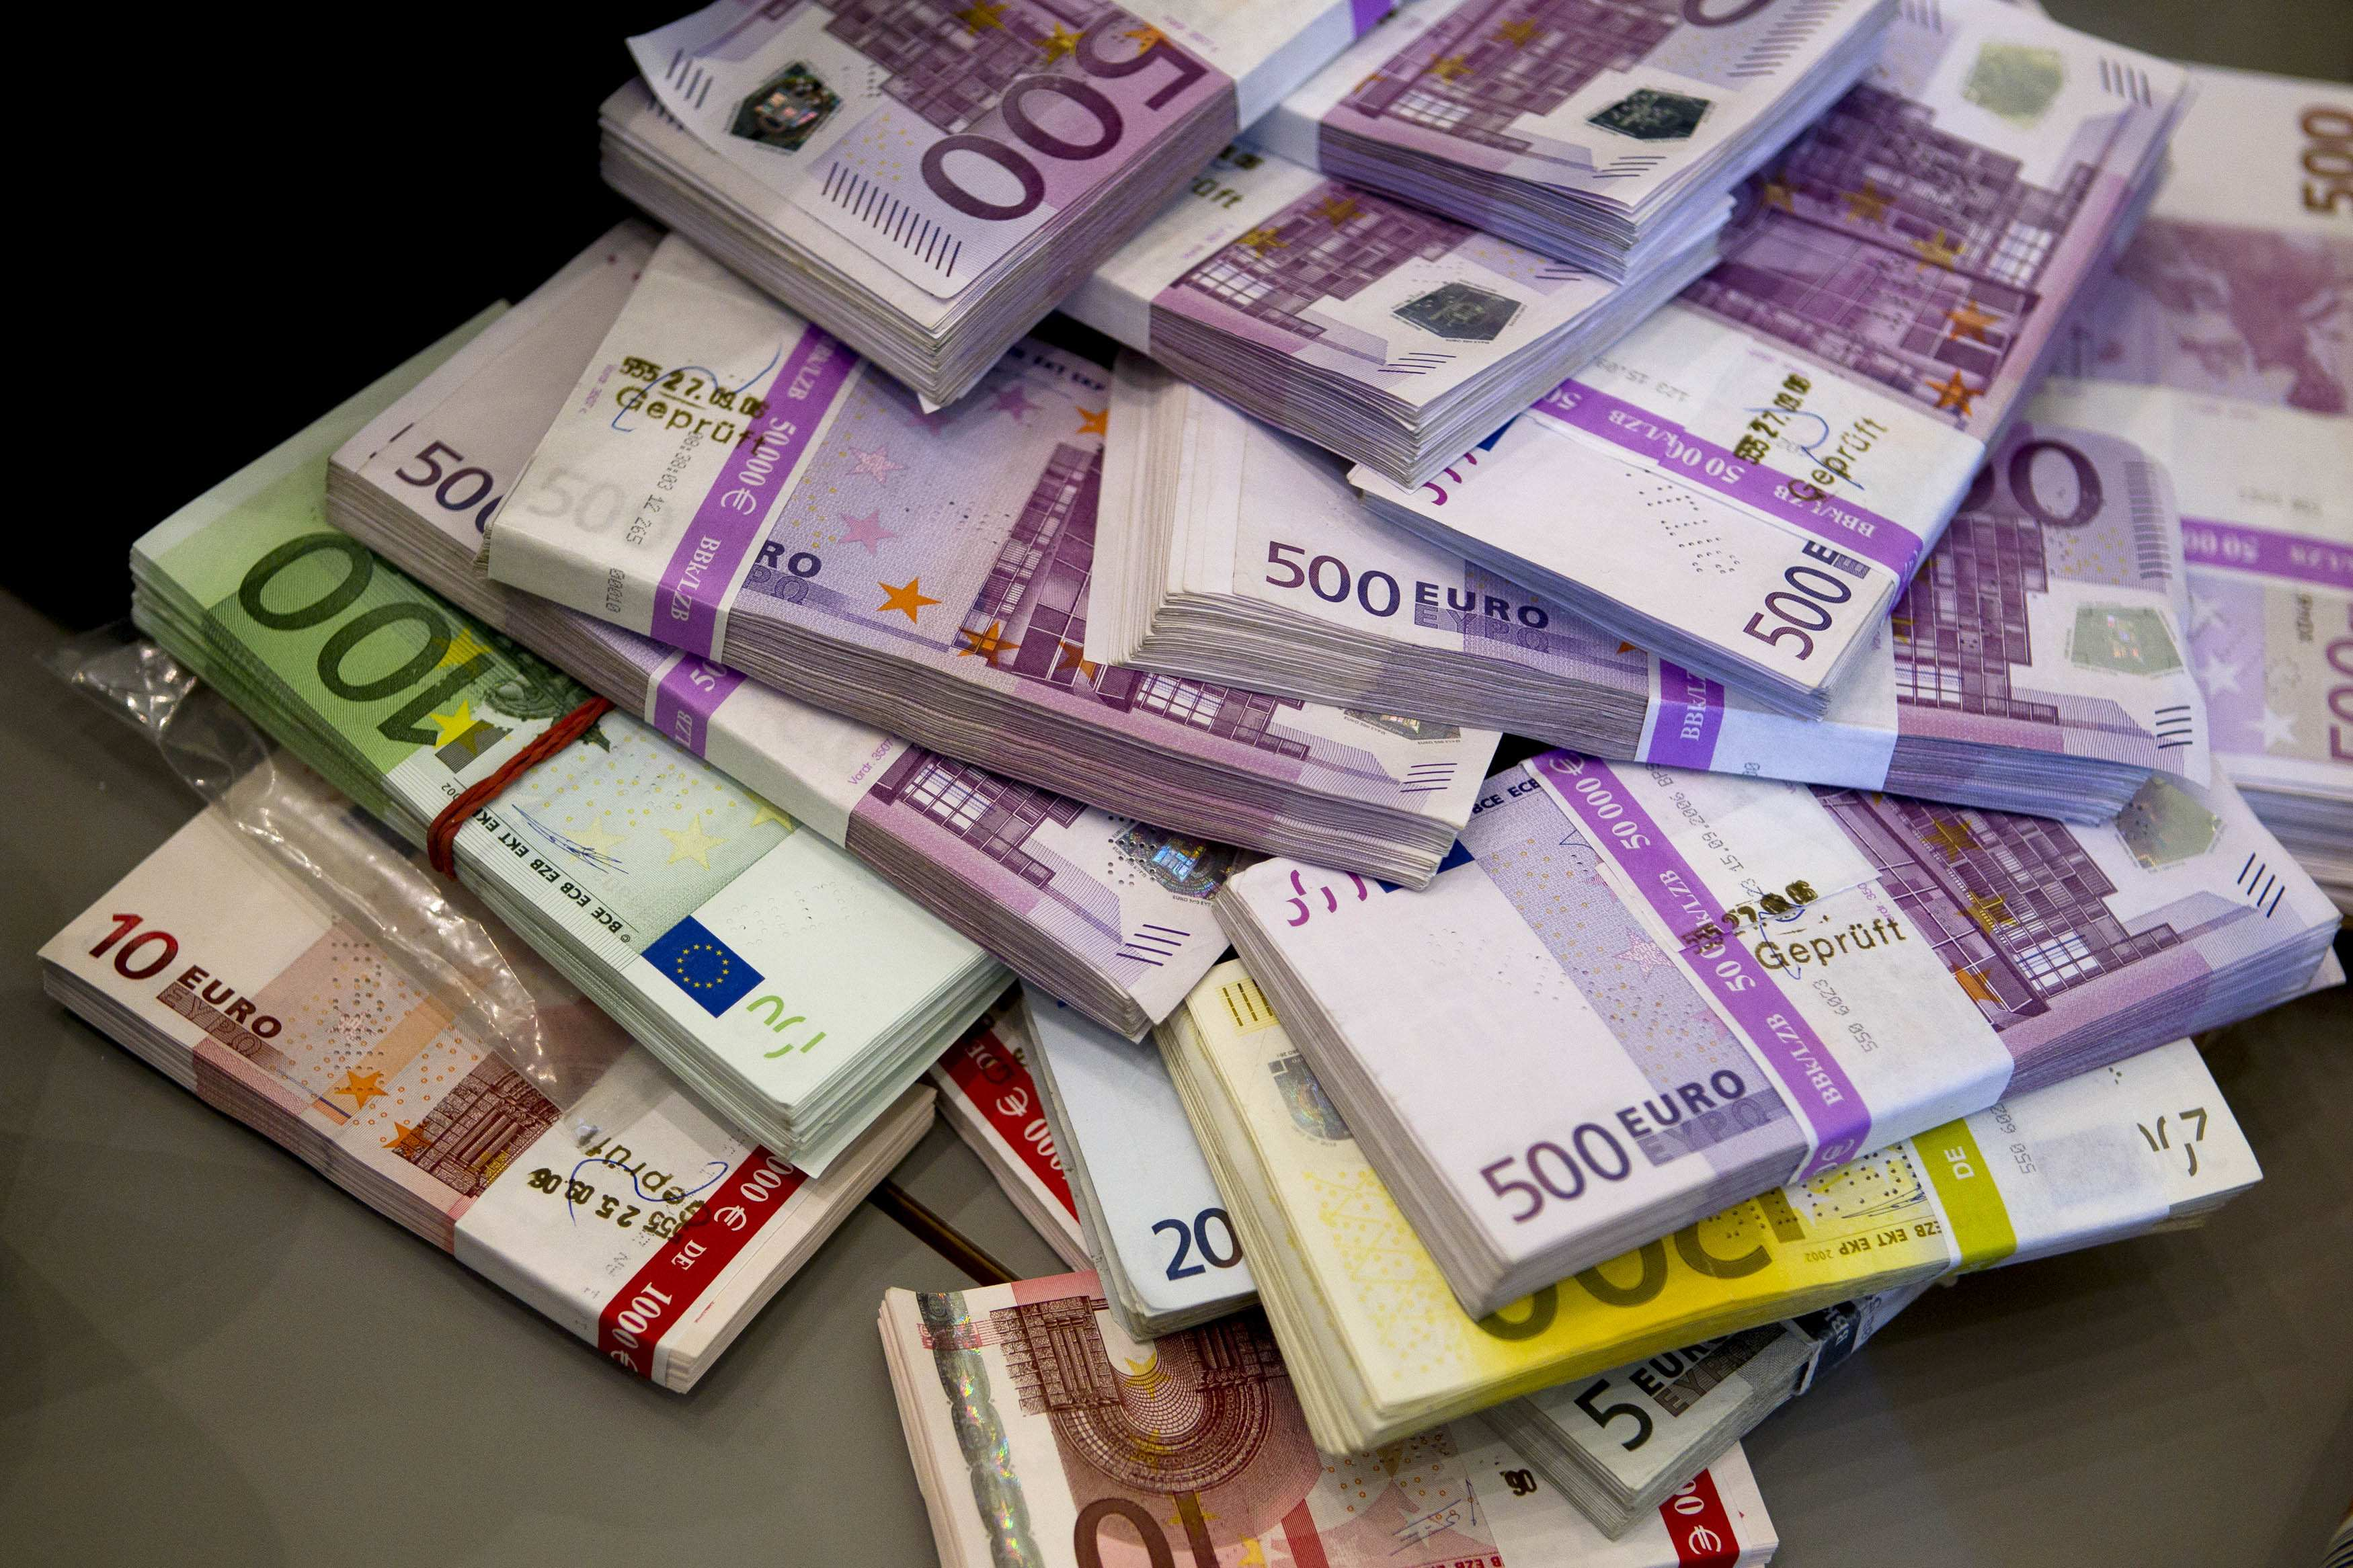 Fiscul cauta turnatori: denuntarea evaziunii va fi rasplatita financiar